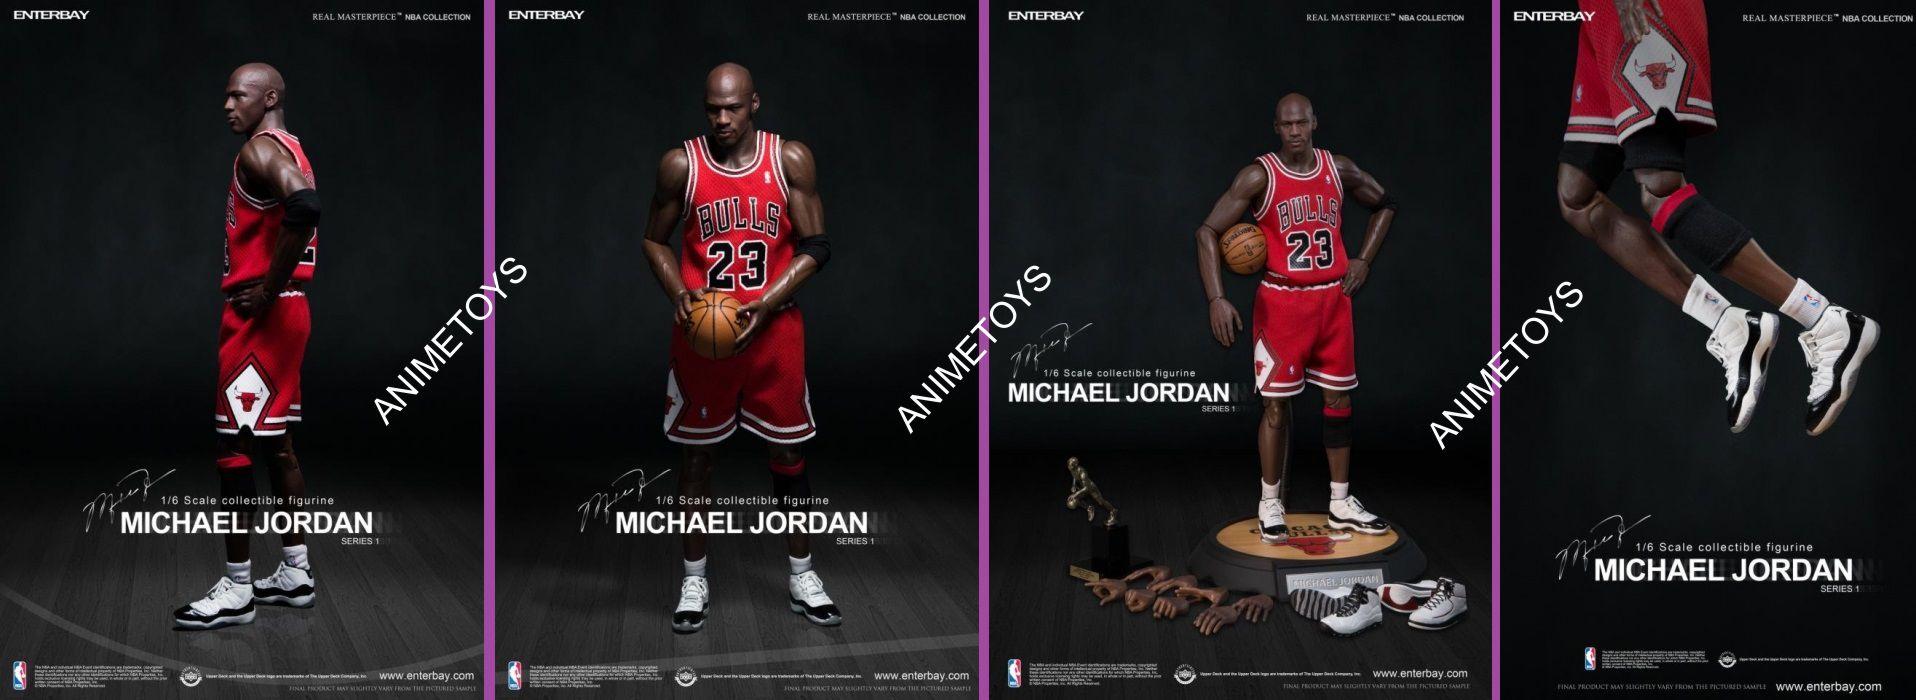 f225810ed5 scarpe di michael jordan online 51 di sconto, grande modelli jordan ...